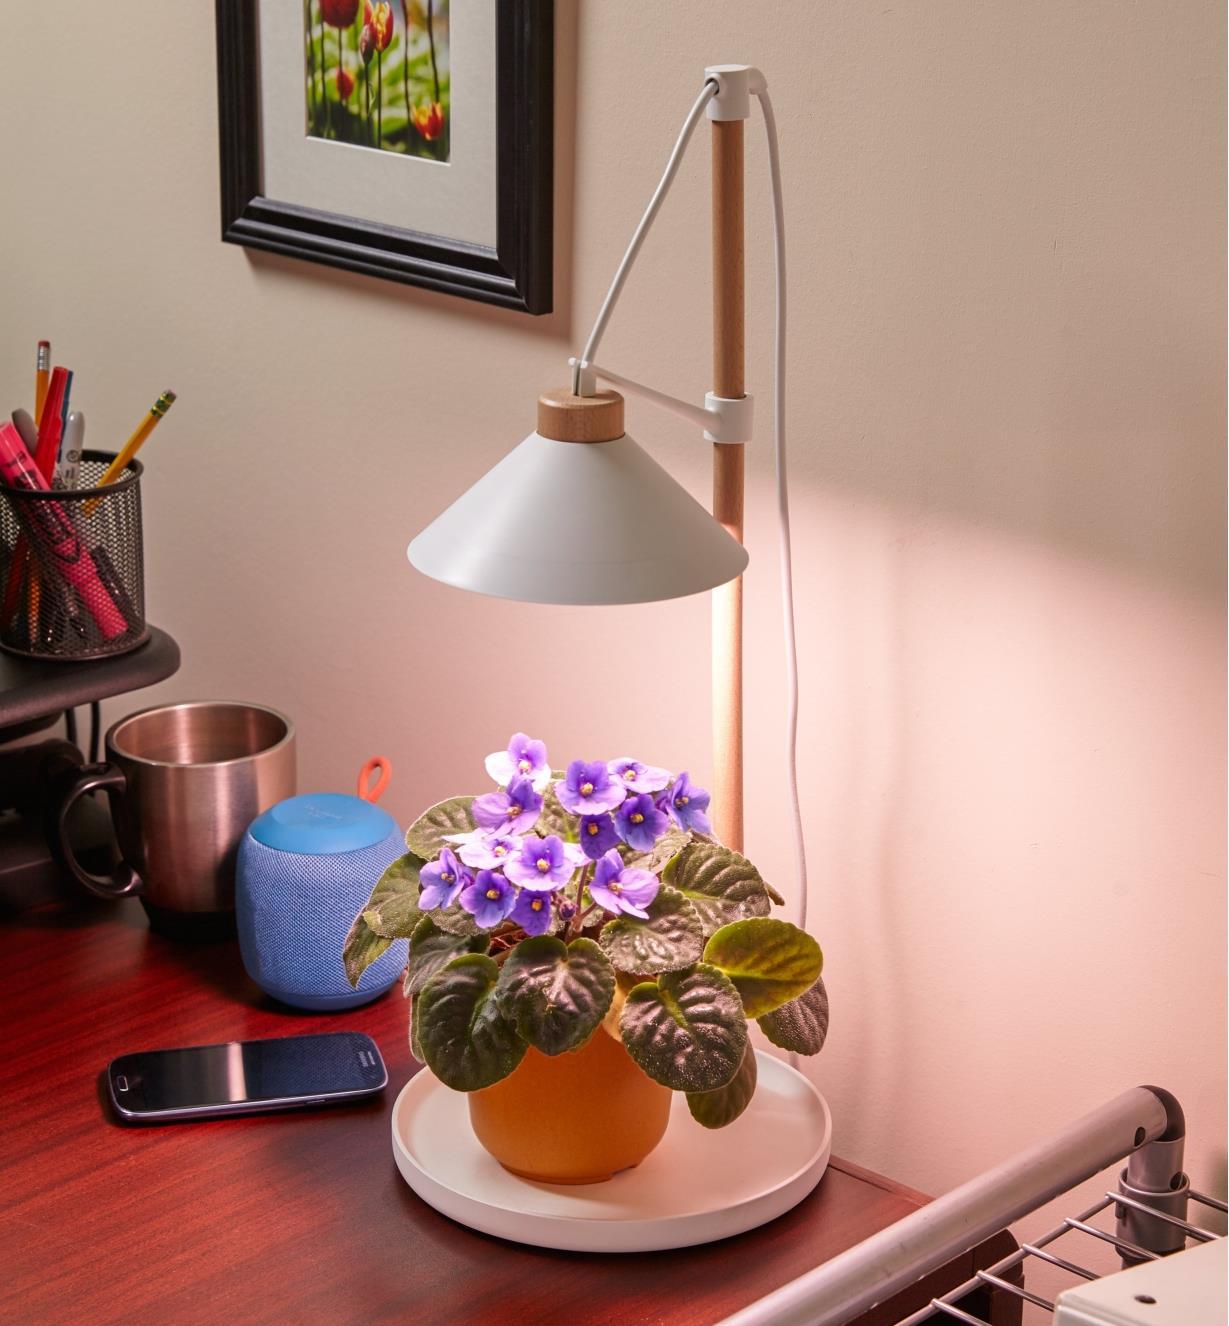 An African violet plant under the LED desk grow light set on an office desk